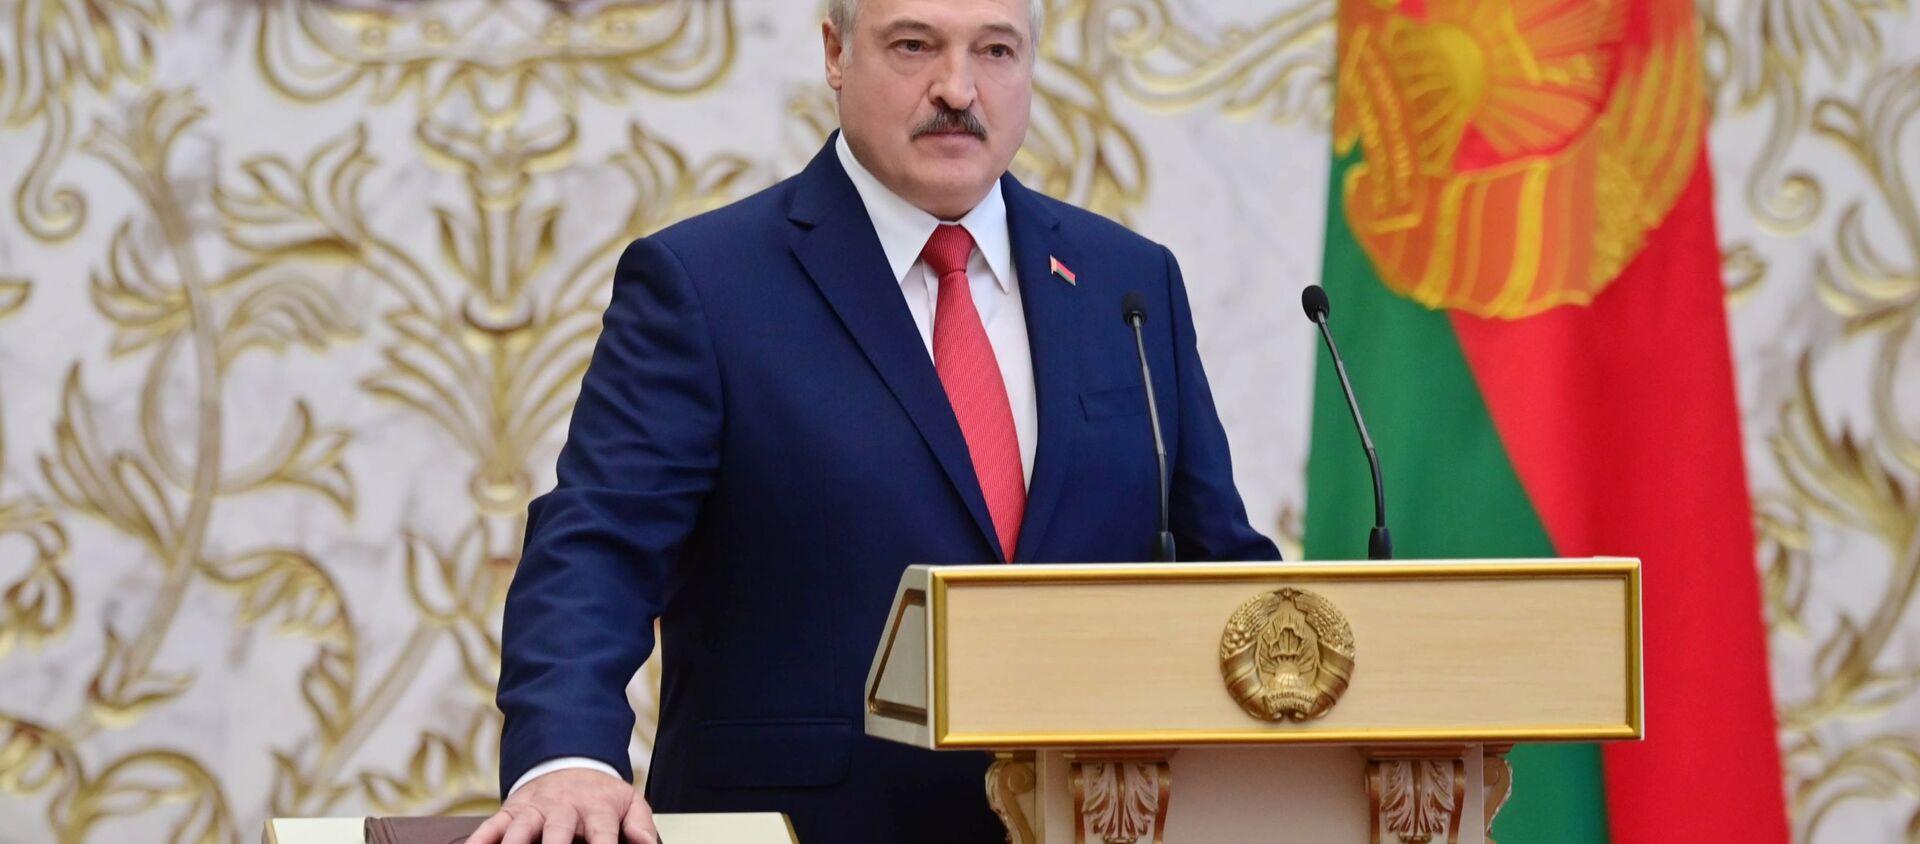 Президент Белоруссии Александр Лукашенко на церемонии инаугурации в Минске - Sputnik Узбекистан, 1920, 27.10.2020